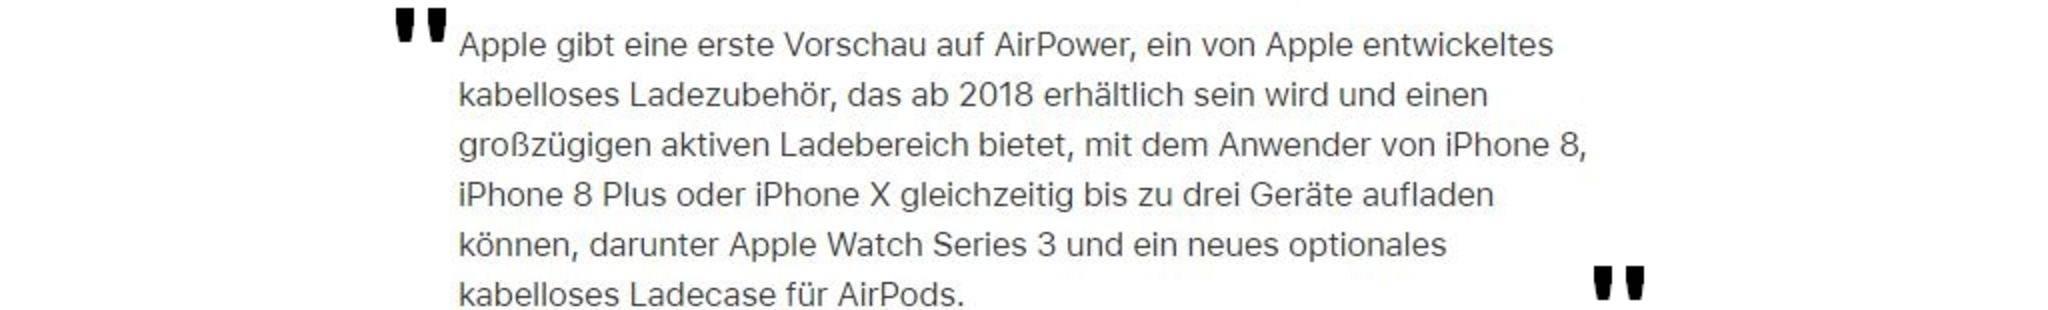 AirPower-Textauszug